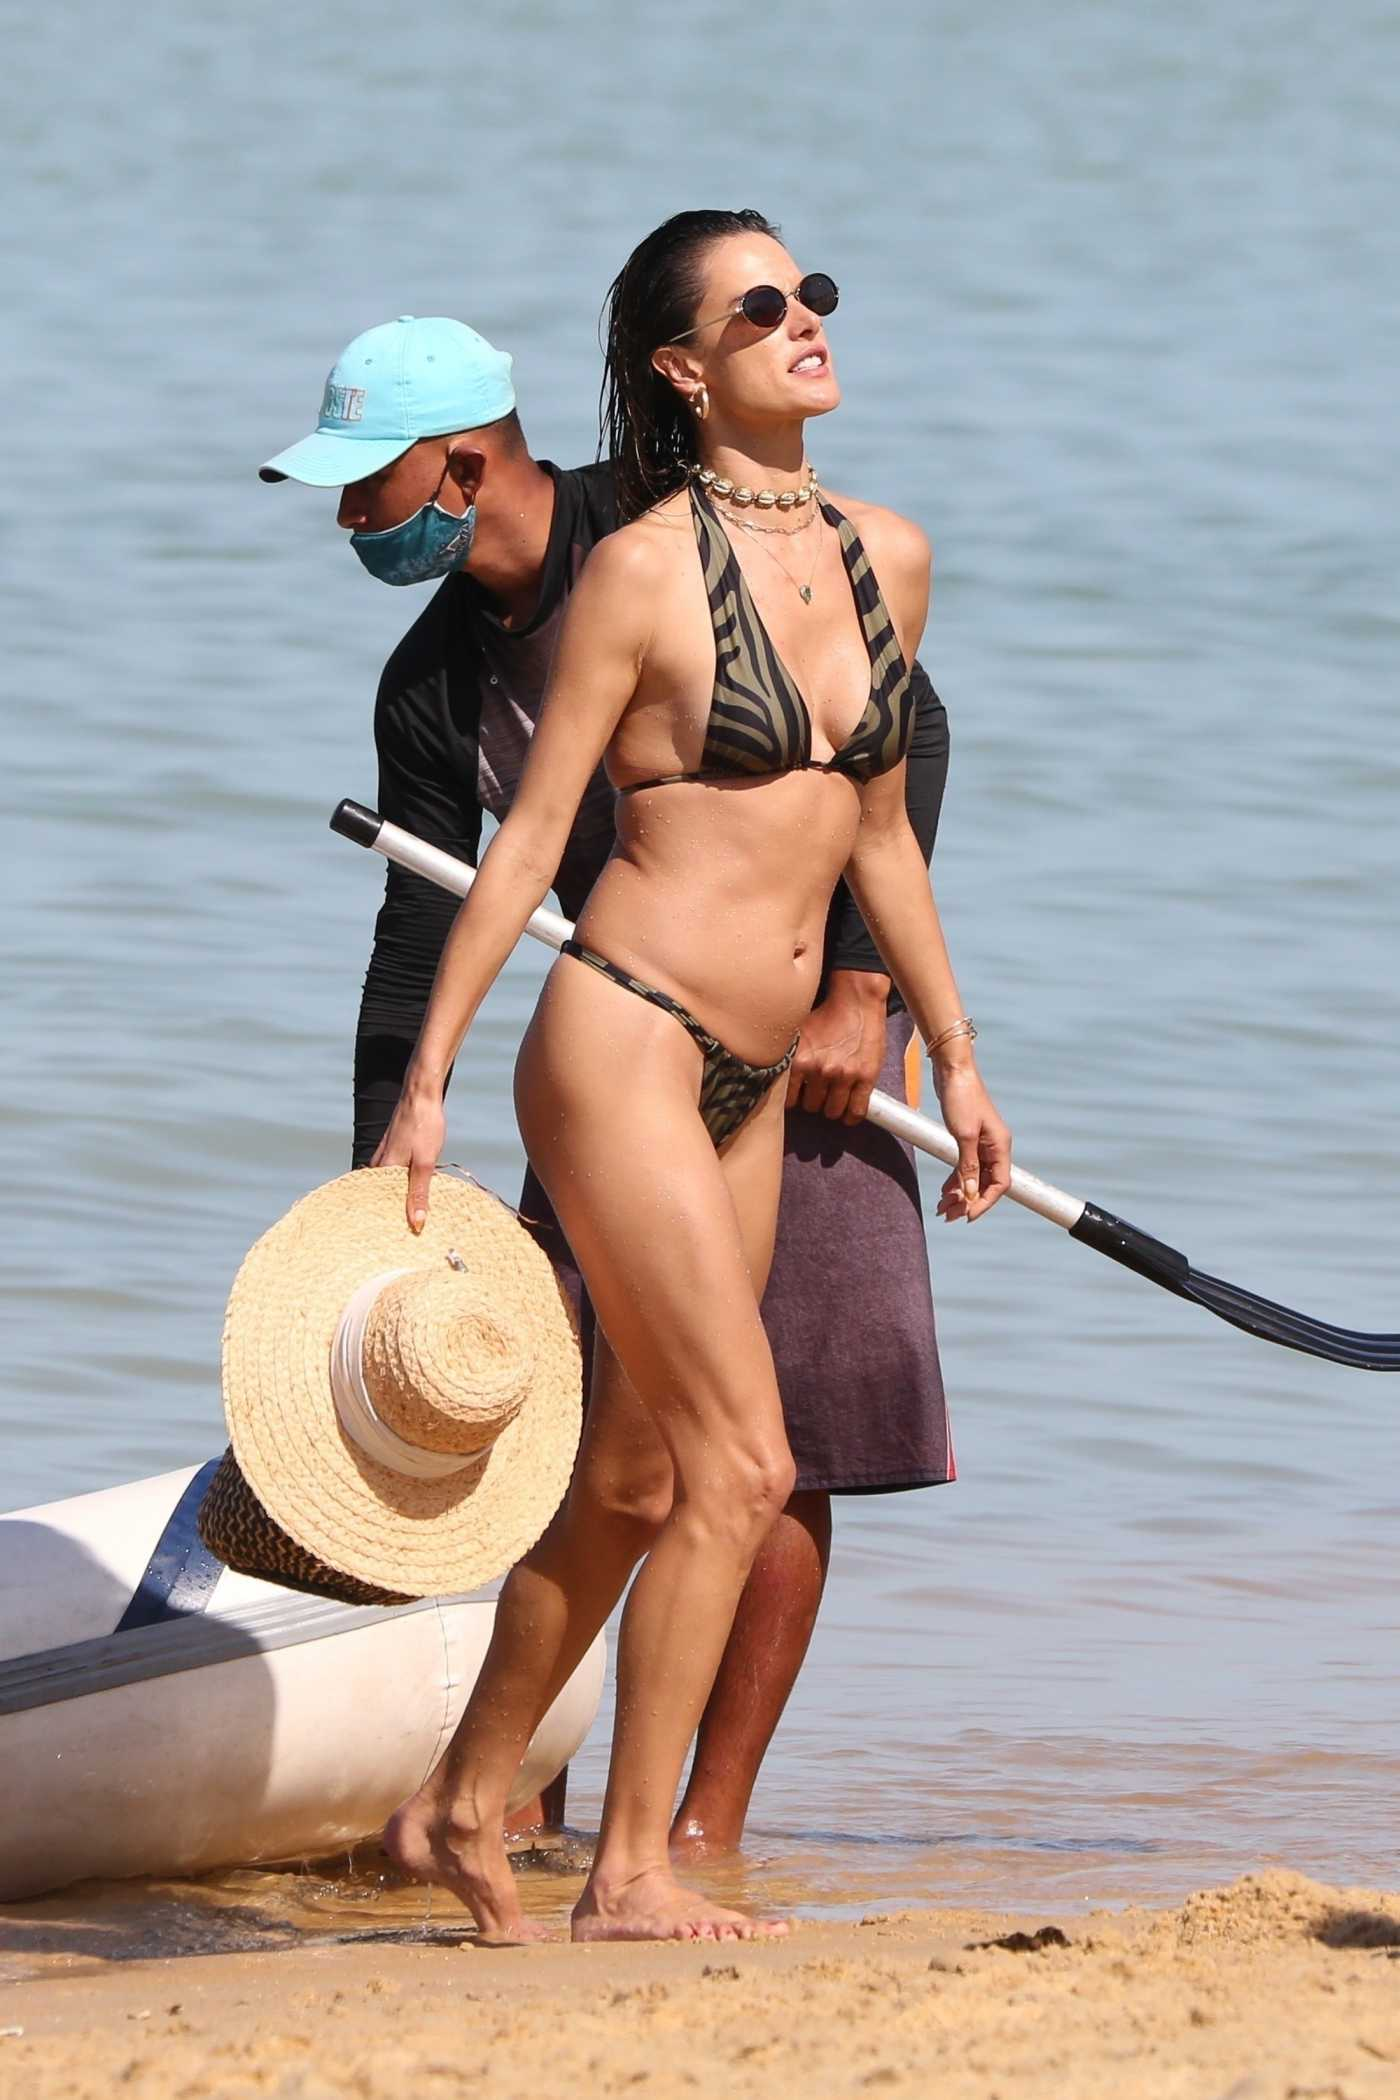 Alessandra Ambrosio in a Zebra Print Bikini on the Beach in Trancoso in Brazil 08/01/2021